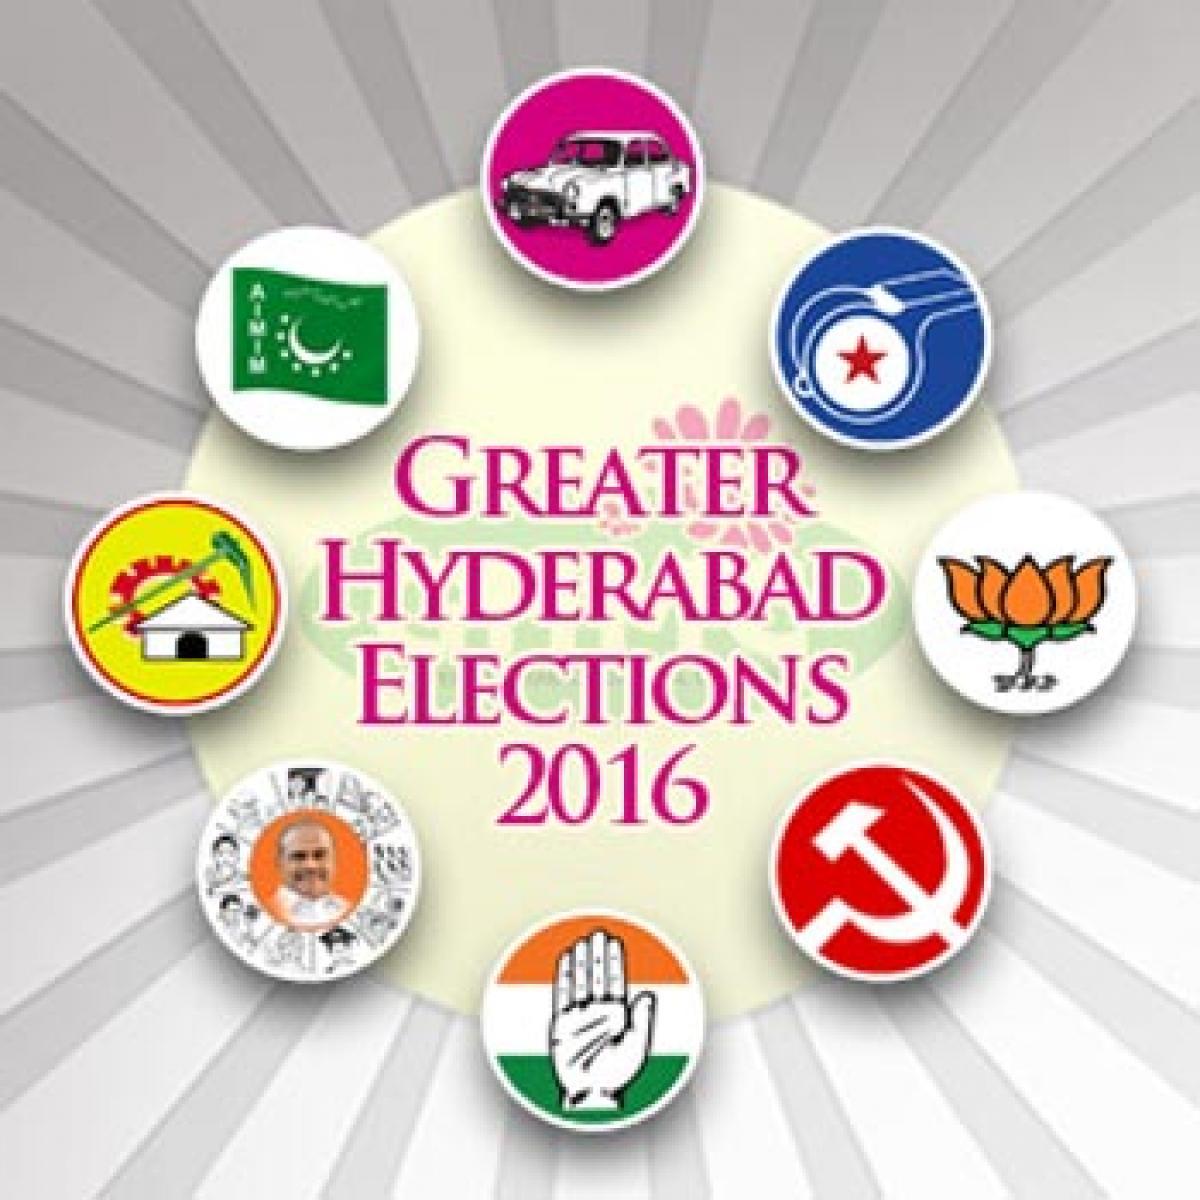 BJP-TDP alliance makes plethora of promises